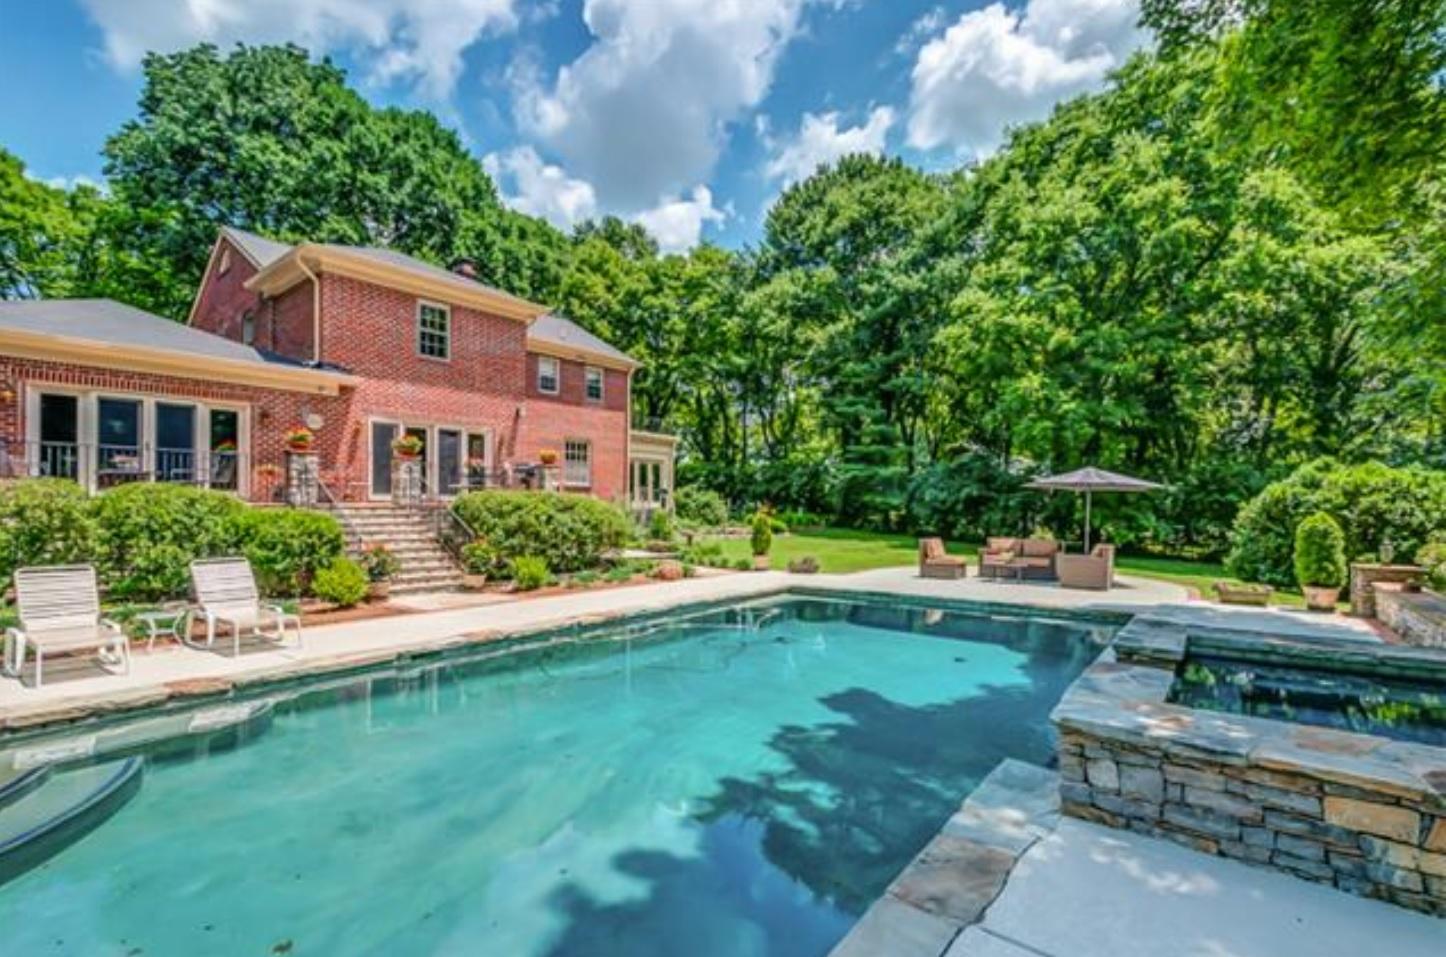 Green hills real estate nashville tn for Swimming pool builders nashville tn